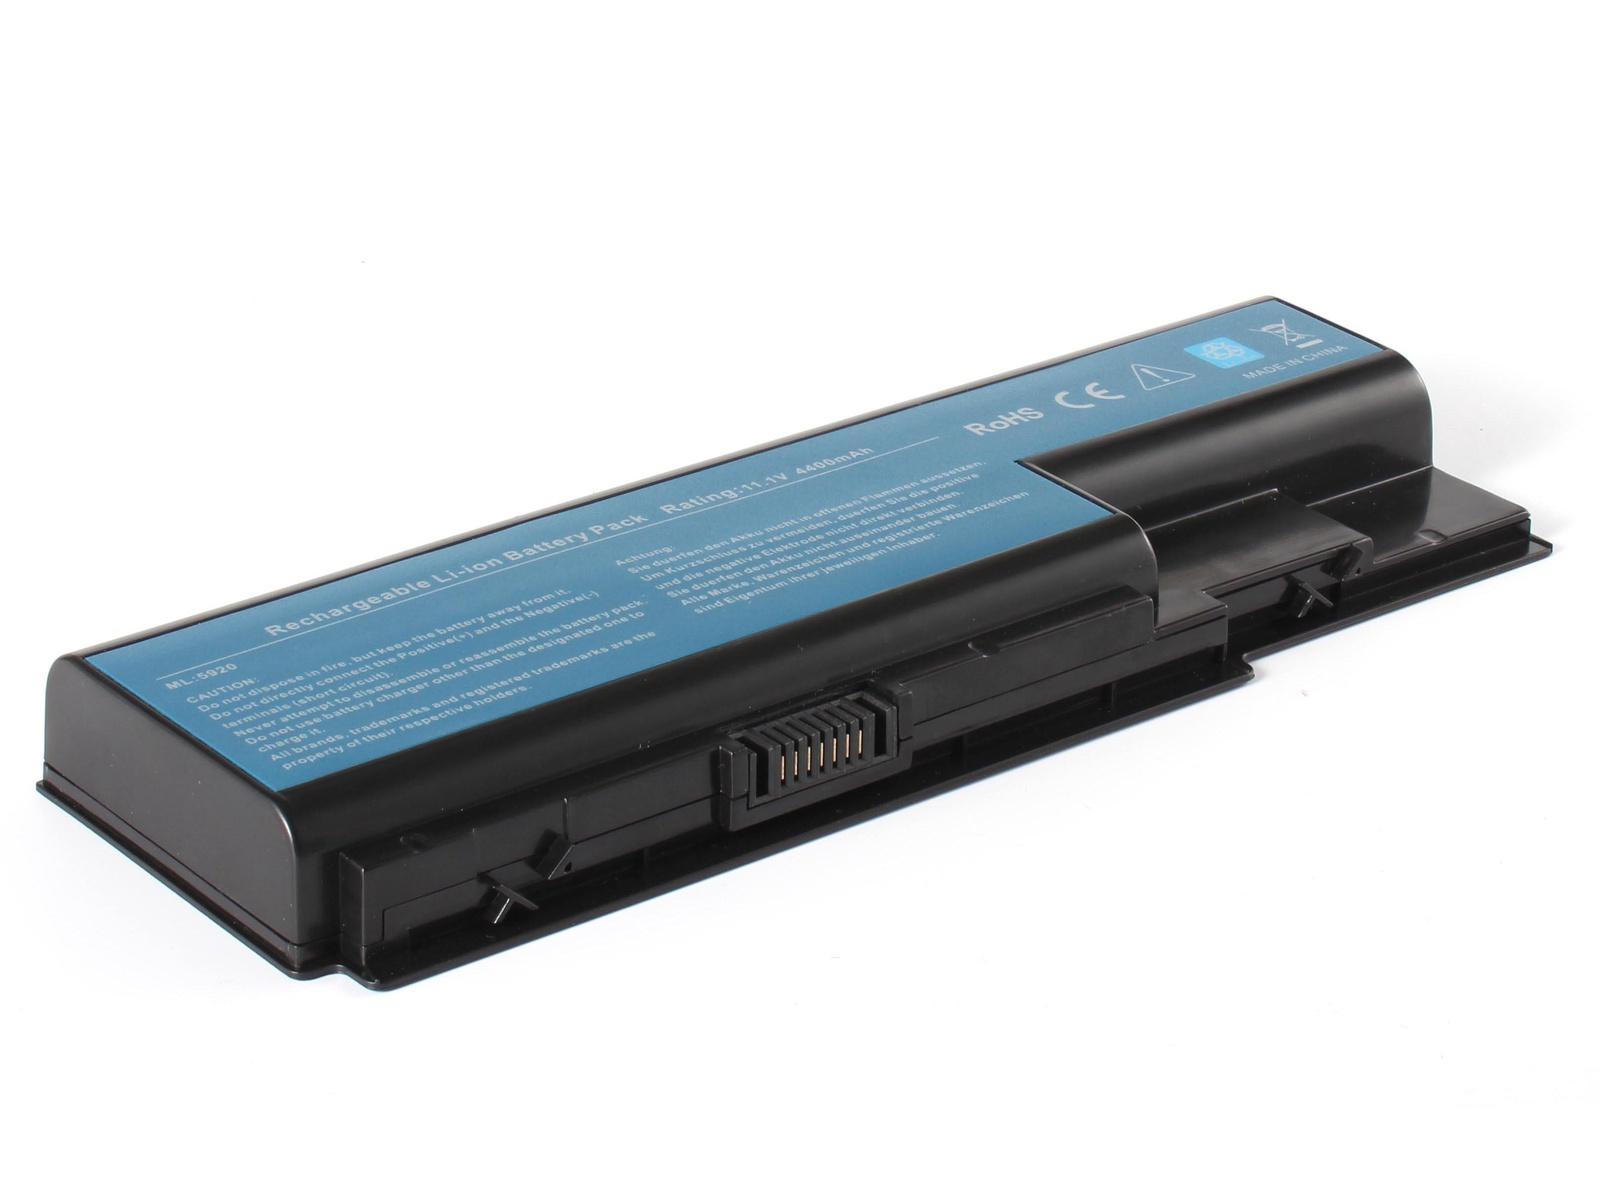 Аккумулятор для ноутбука AnyBatt для Acer Aspire 5925G, Aspire 5930G-844G32BN, Aspire 7720Z-1A2G16MI, Aspire 7720ZG-2A2G25Mi, Aspire 7738G-904G100Bi, Aspire 8920G-6A4G32BN, Aspire 8935G-654G32Mi, Aspire 8942G-434G50Mi 8cell 14 8v as07b31 original laptop battery for acer aspire as07b32 5520 5720 5920g 5930g 6920g 6930g 7520g 7330 5930g as07b51